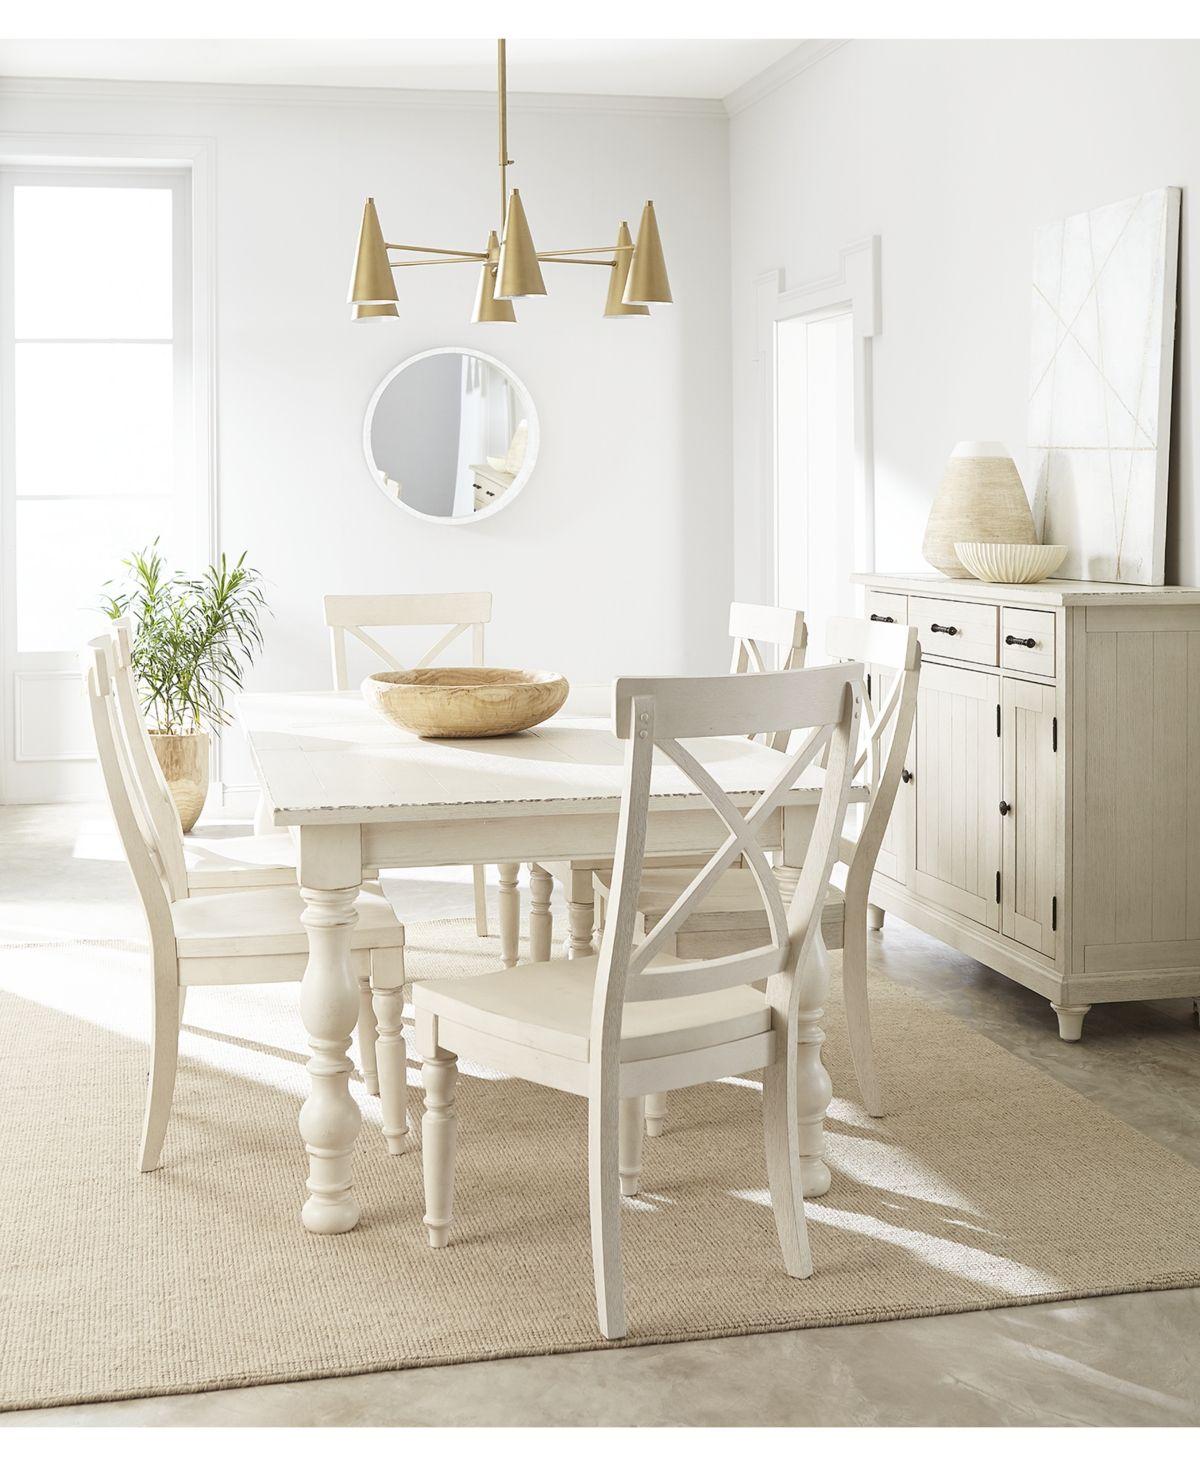 Aberdeen worn white expandable dining furniture 7pc set